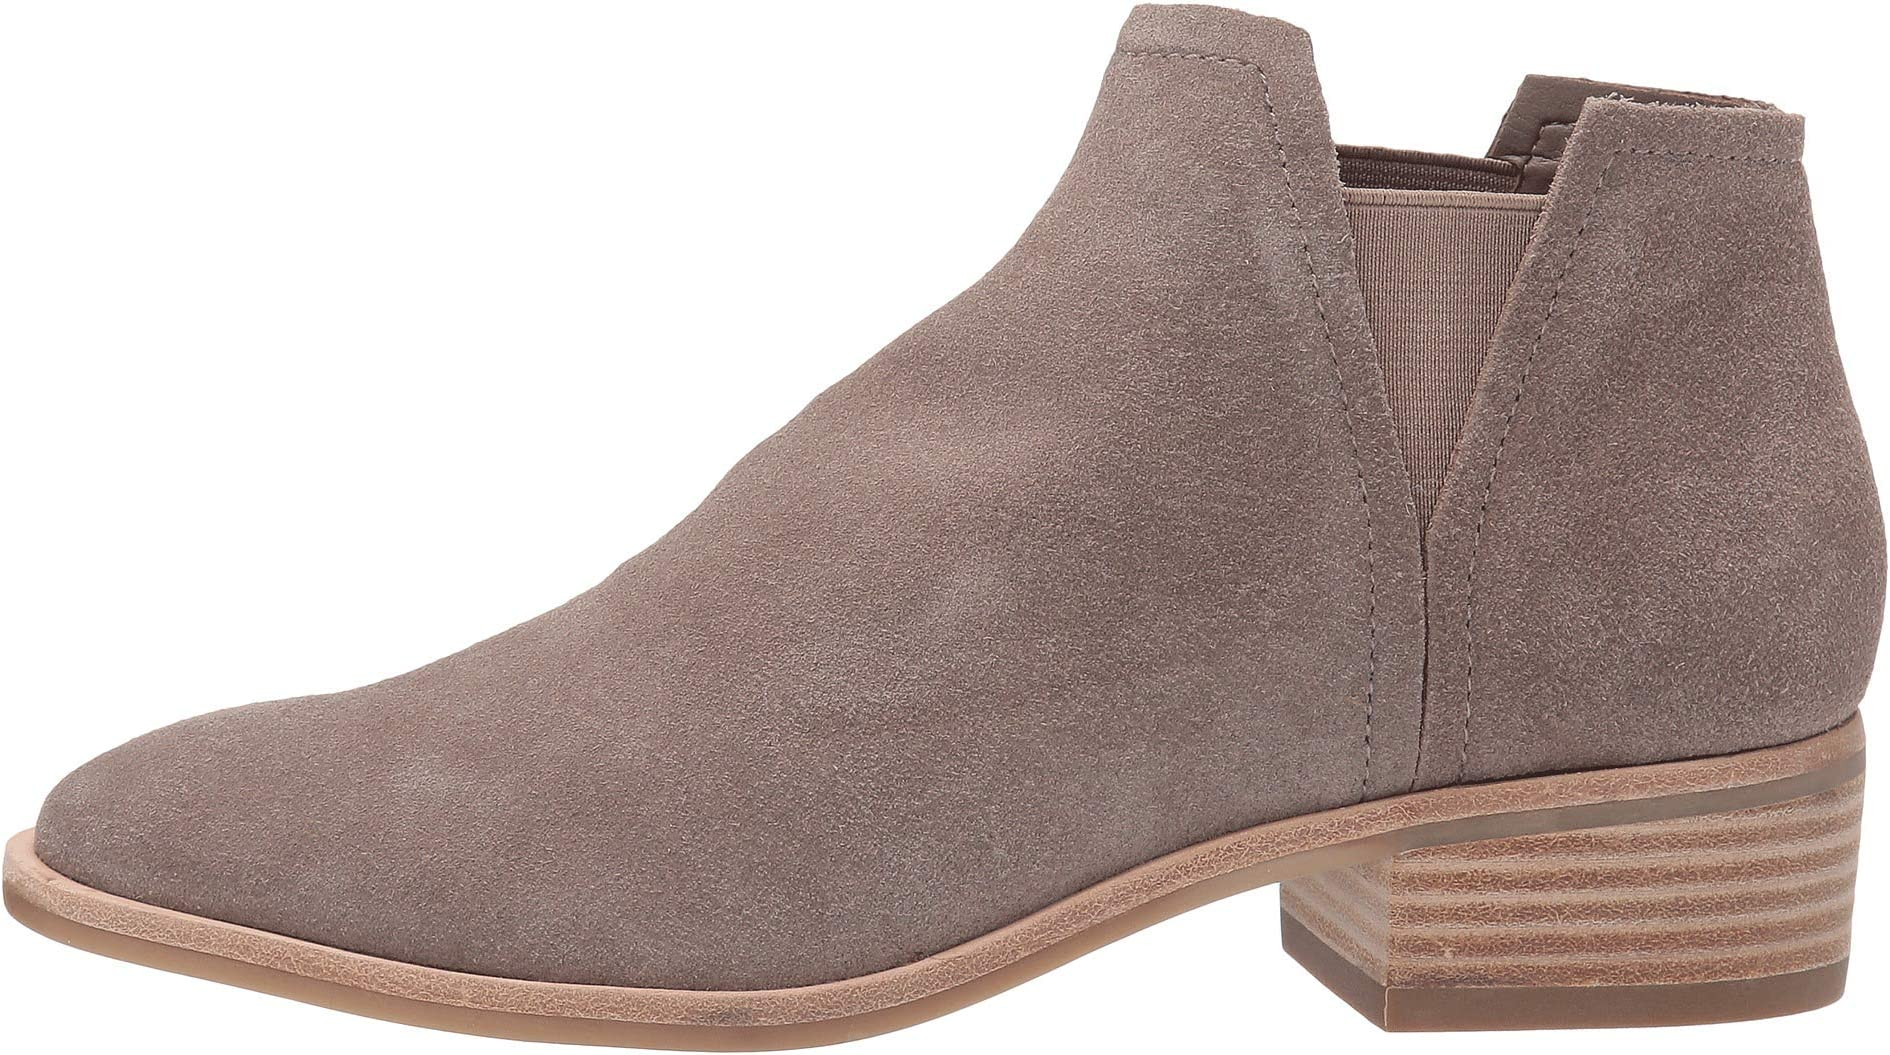 Dolce Vita Tarah   Women's shoes   2020 Newest